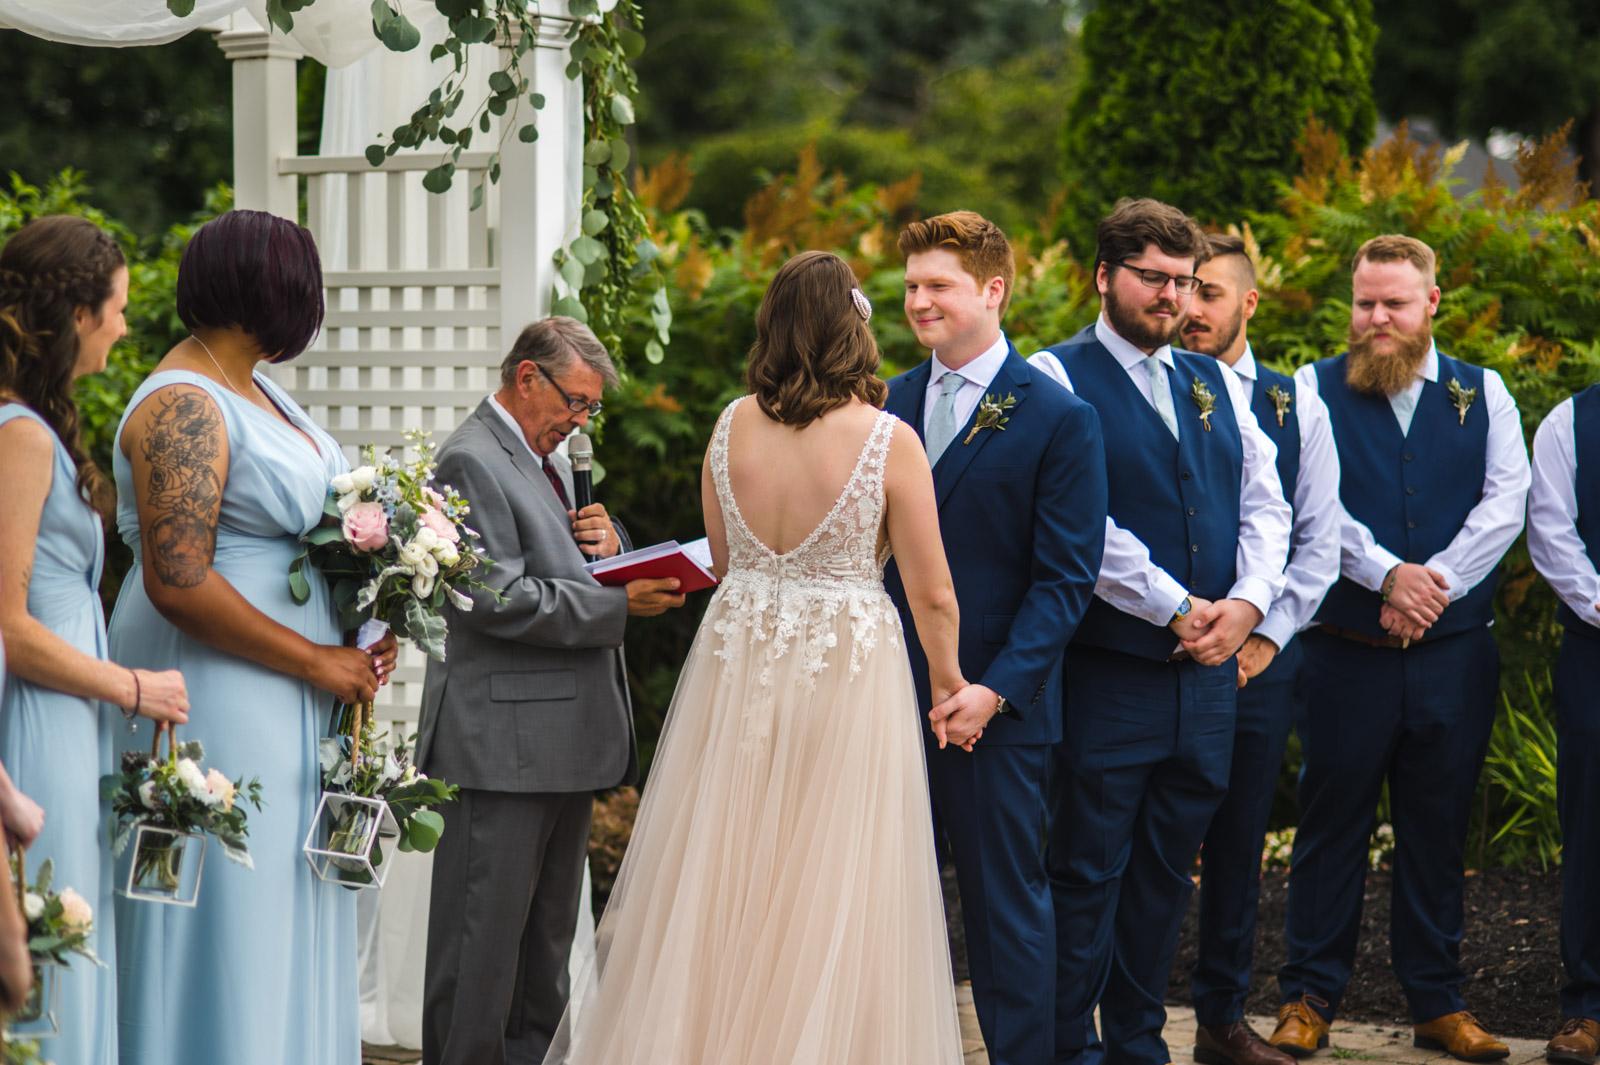 Emerson & Elicia's Golf Course Wedding Aidan & Leanne Hennebry Hamilton Wedding Videographers Photographers Niagara Hush Hush Photography & Film-21.jpg